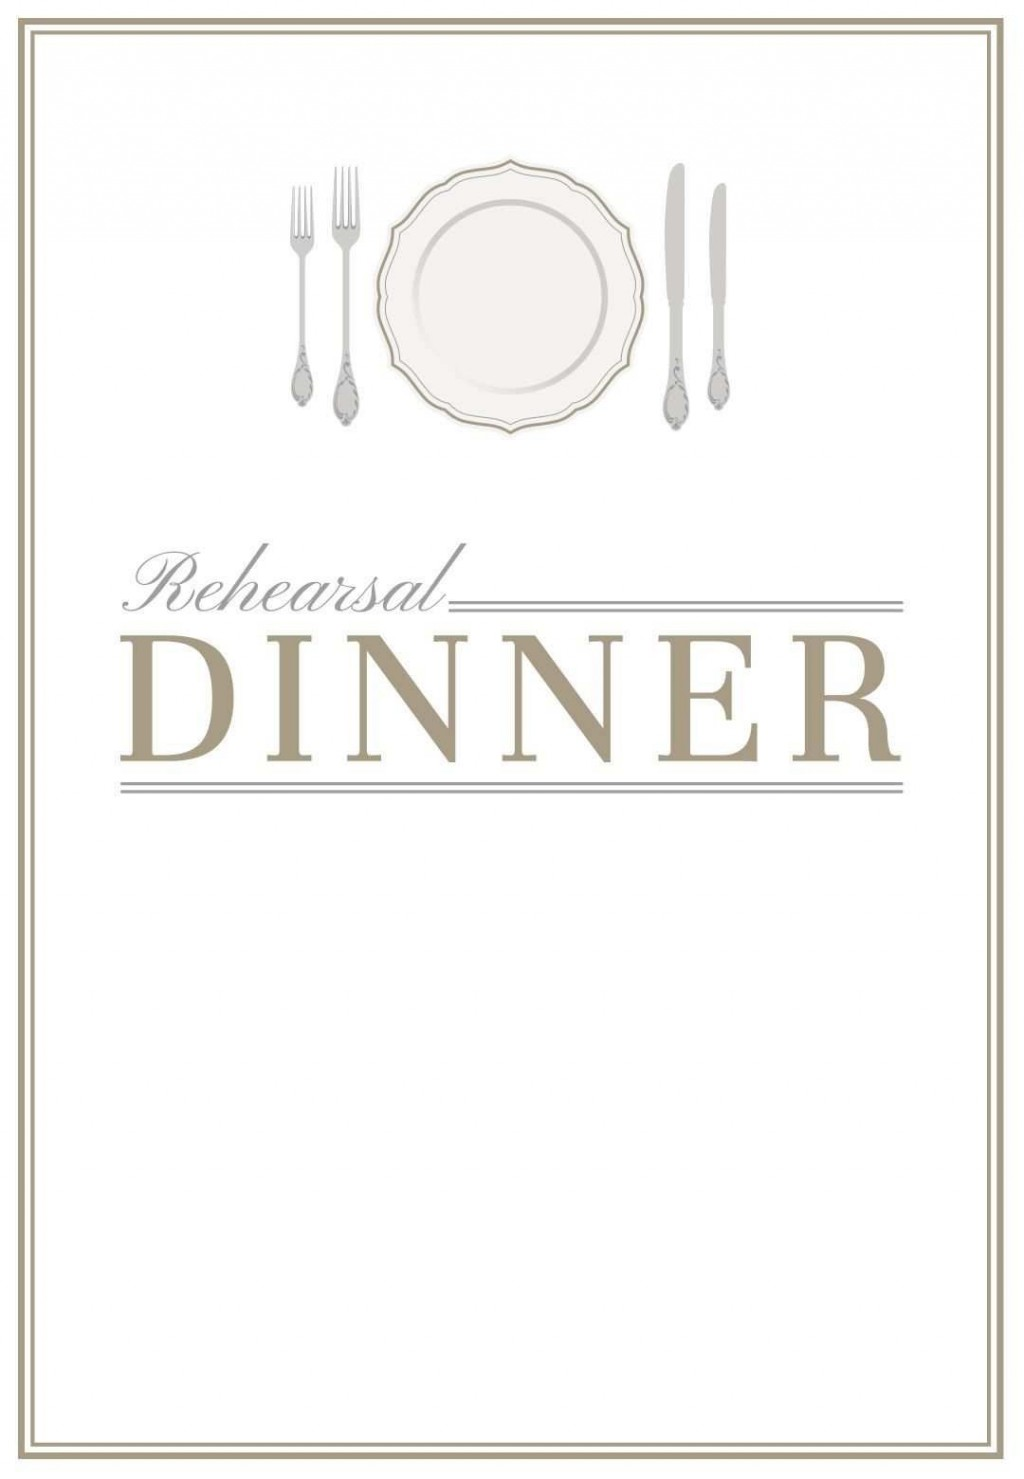 003 Remarkable Free Dinner Invitation Template Picture  Templates Rehearsal Printable Italian ThanksgivingLarge